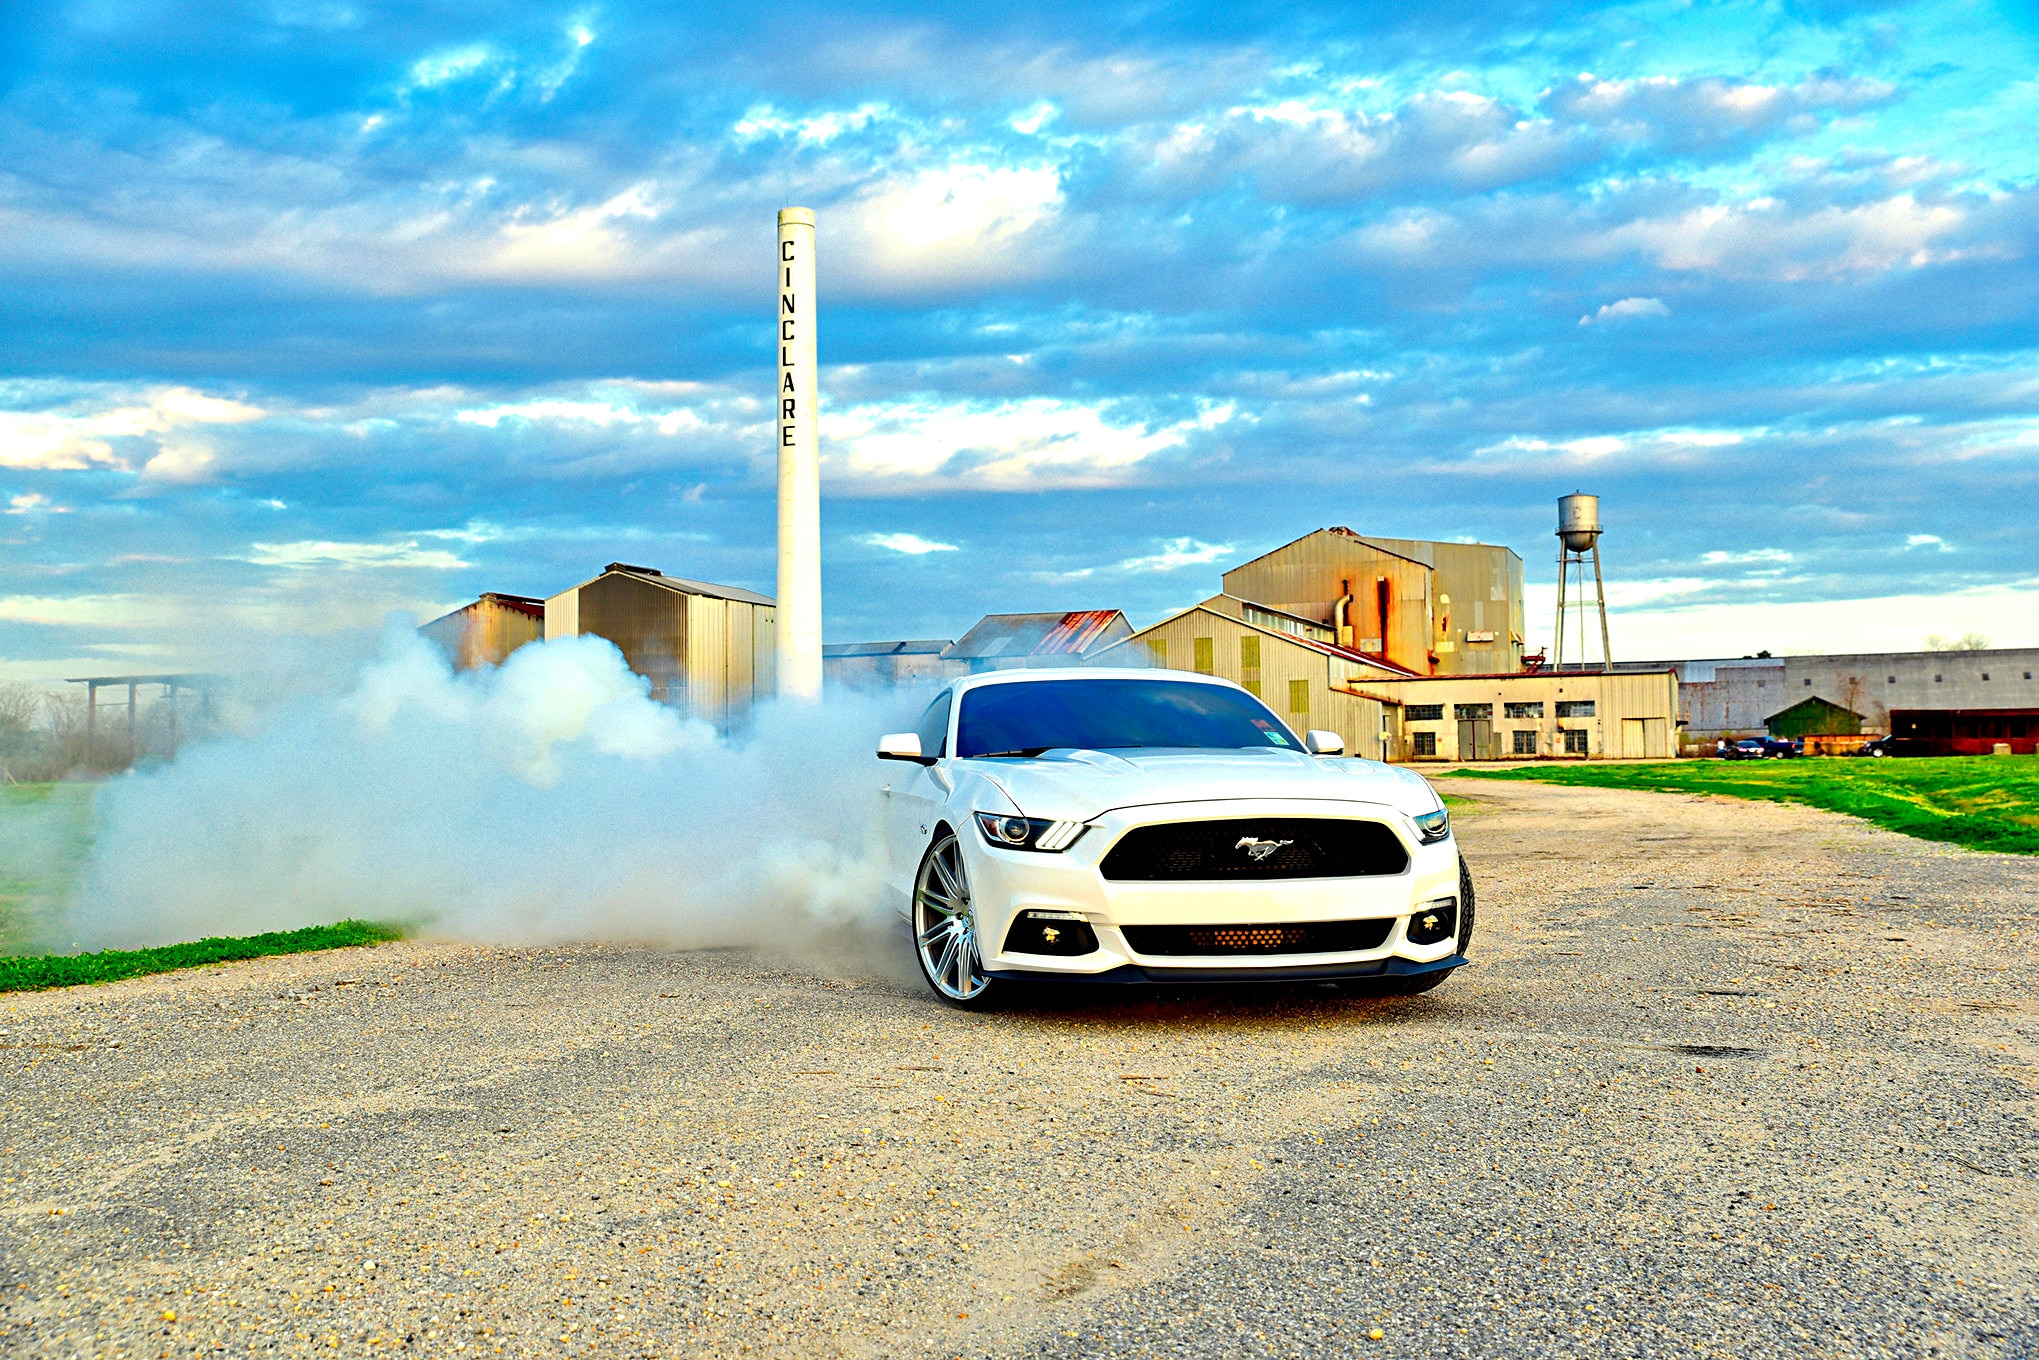 Sheldon Lewis S550 Ford Mustang 021